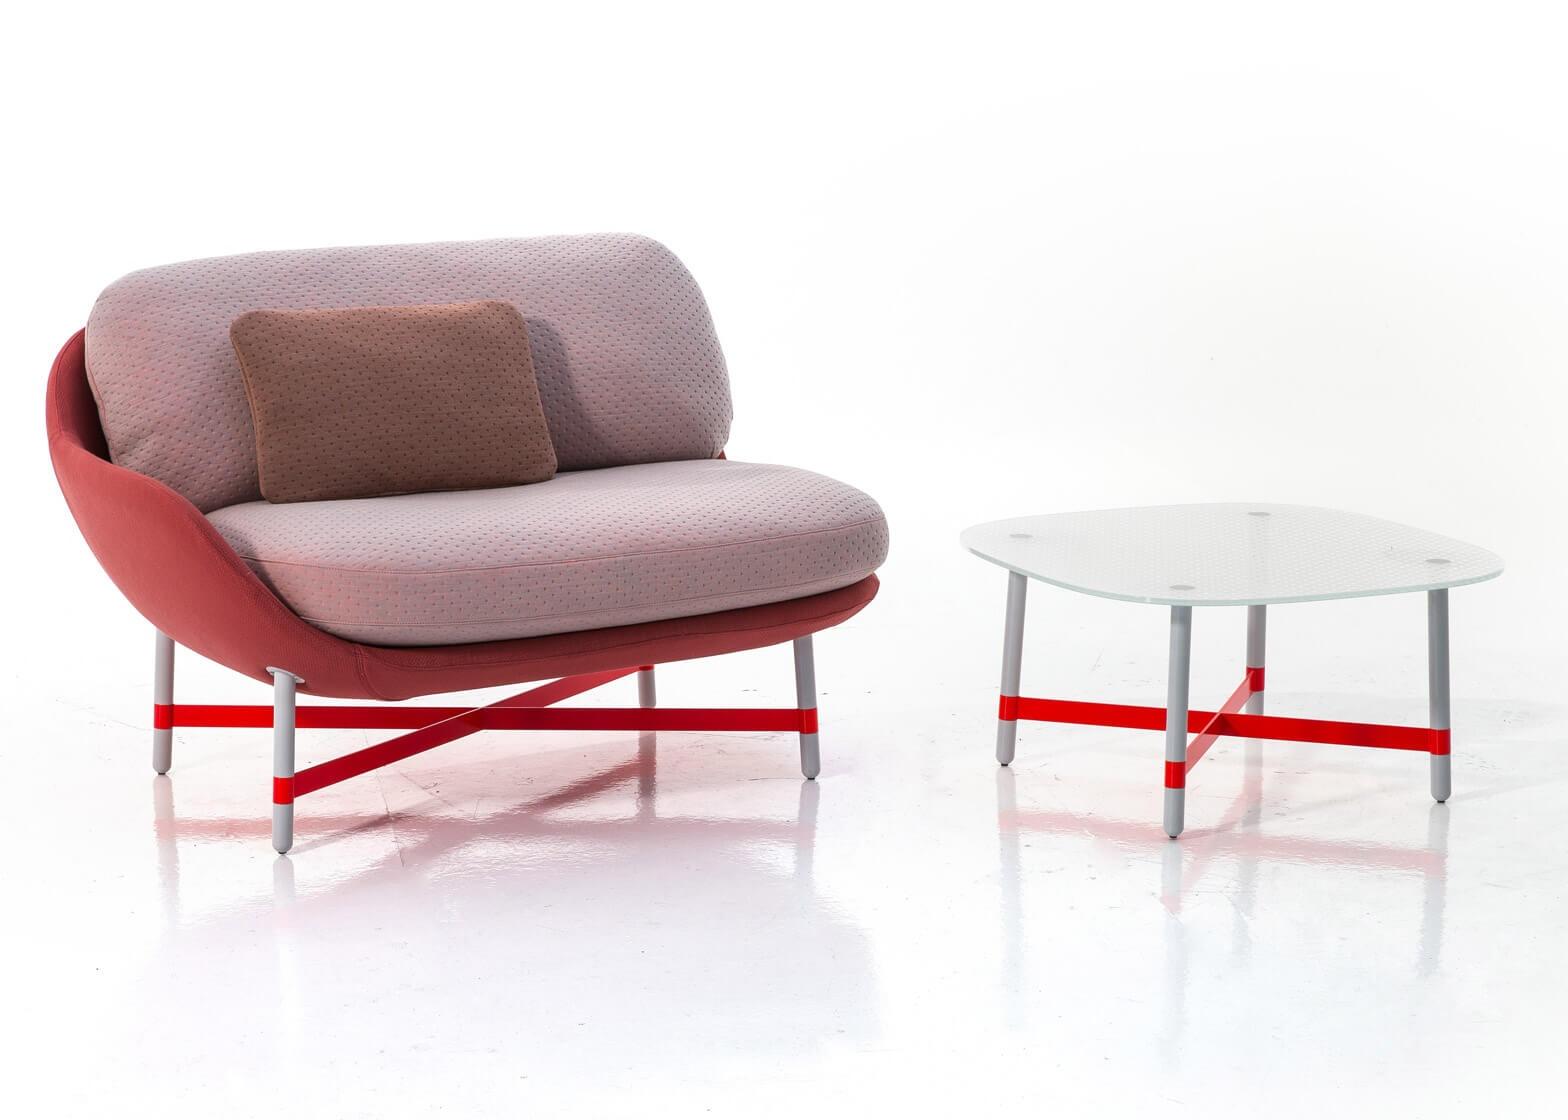 ottoman-scholten-baijings-seating-furniture-moroso-milan-design-week-2016_dezeen_1568_1